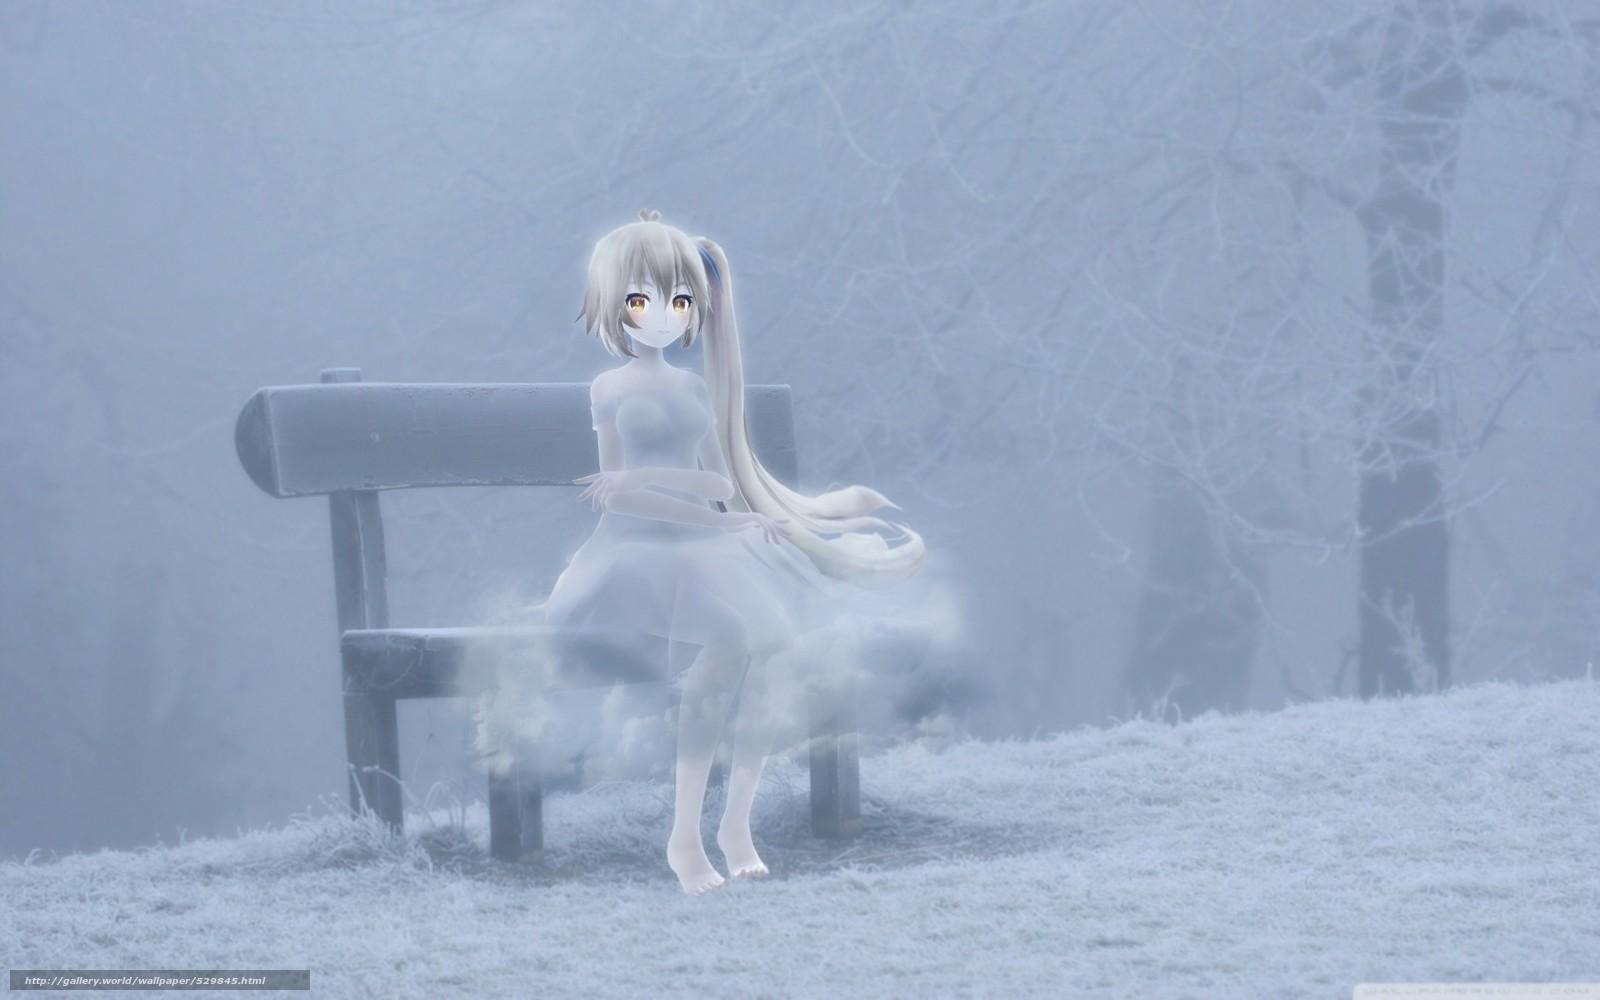 Фото девушка холодно одиноко сидит на лавочке 6 фотография